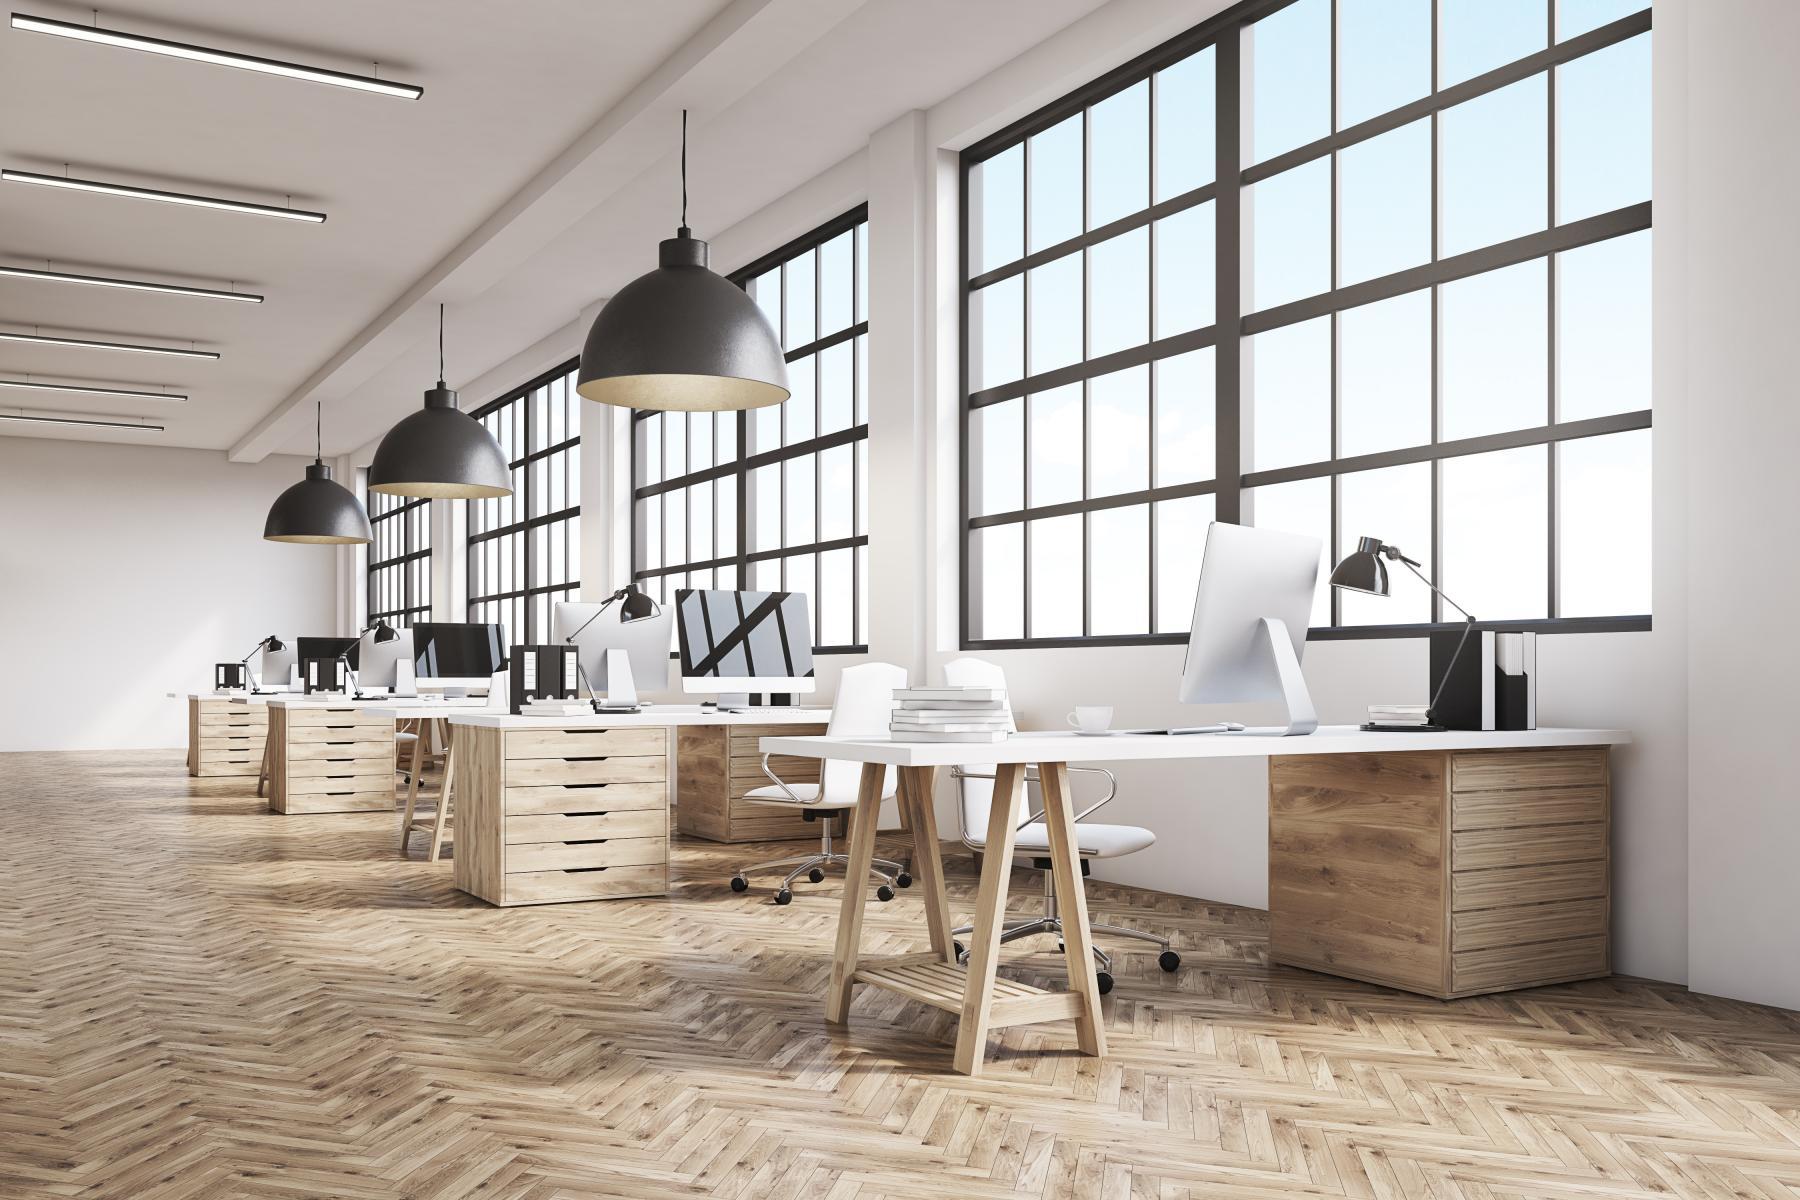 location bureau coworking paris 2 sentier